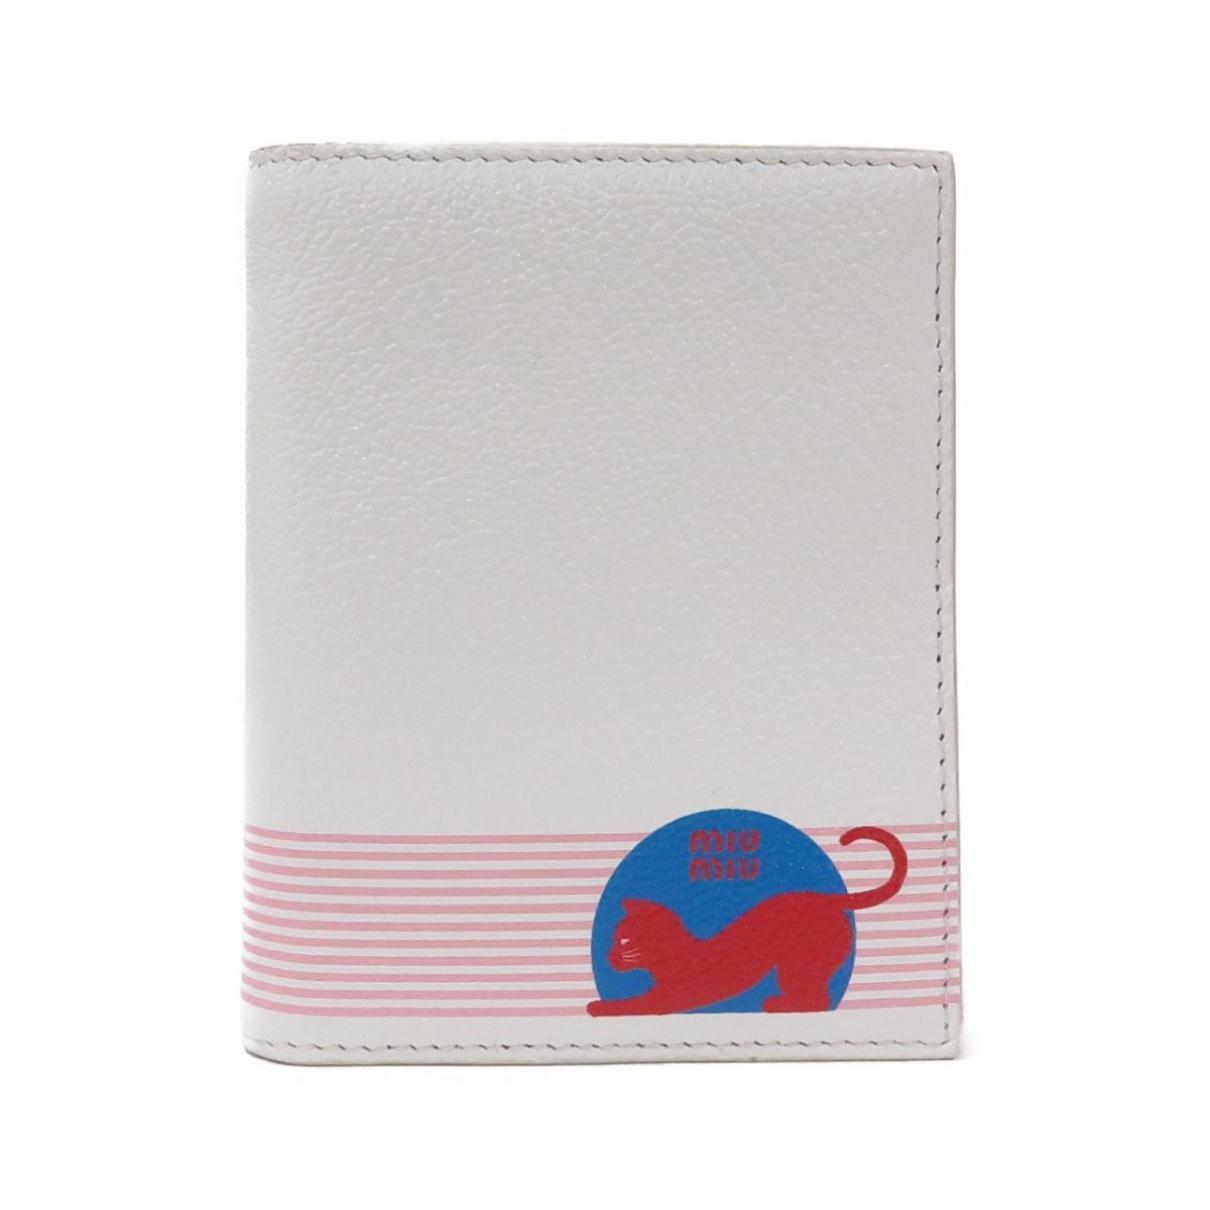 Miu Miu - Portefeuille   pour femme en cuir - multicolore